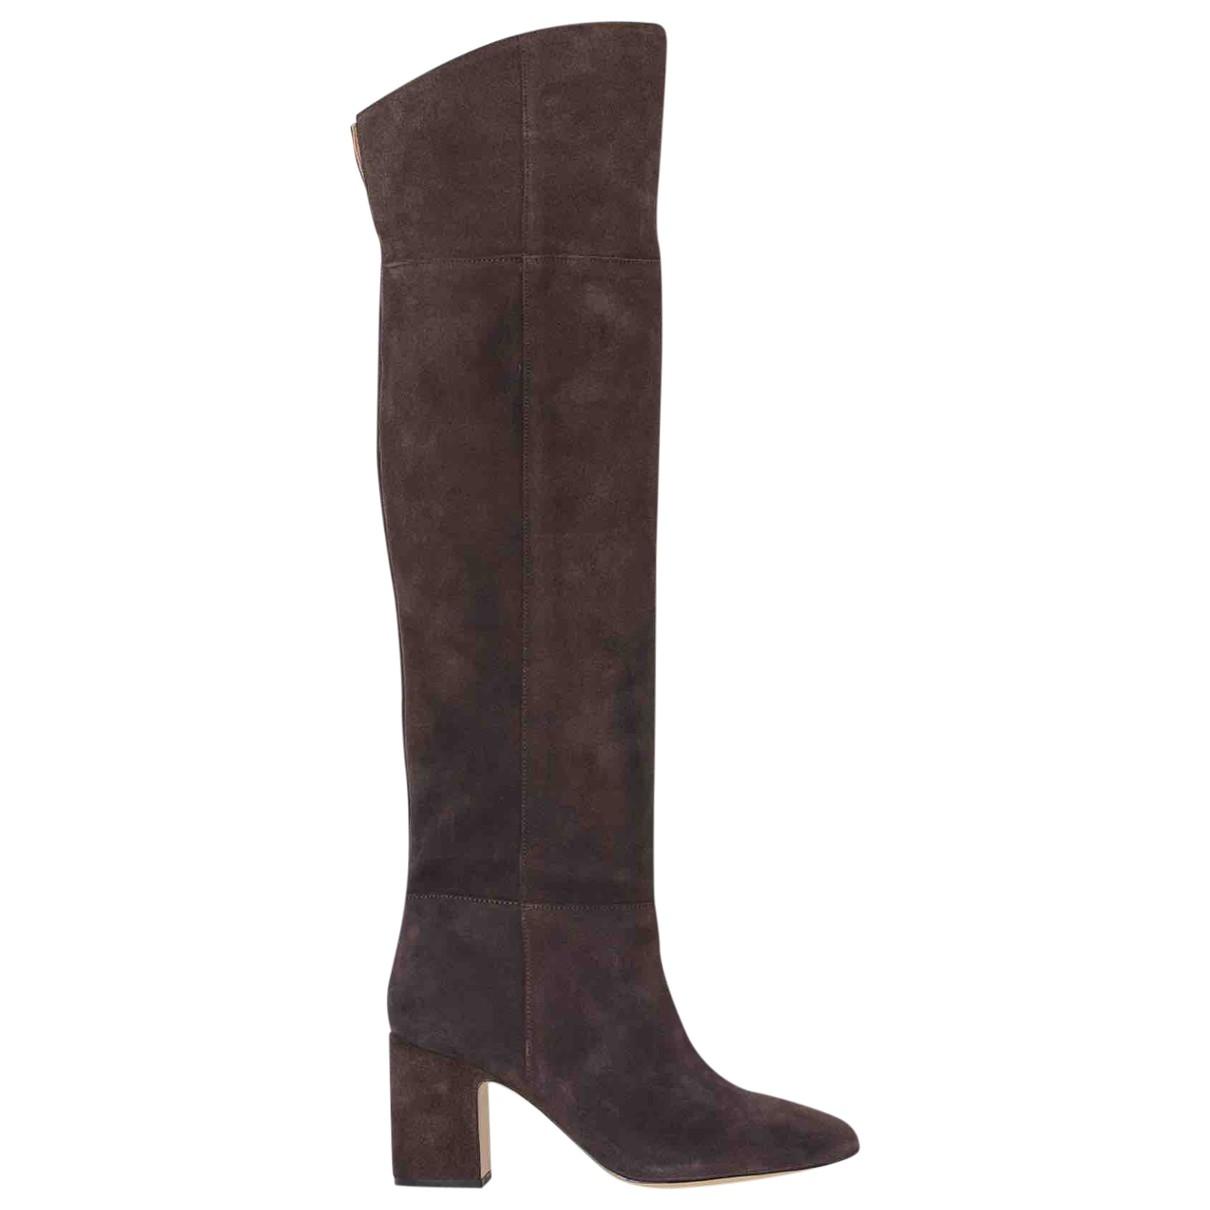 H&m Studio \N Brown Suede Boots for Women 40 EU